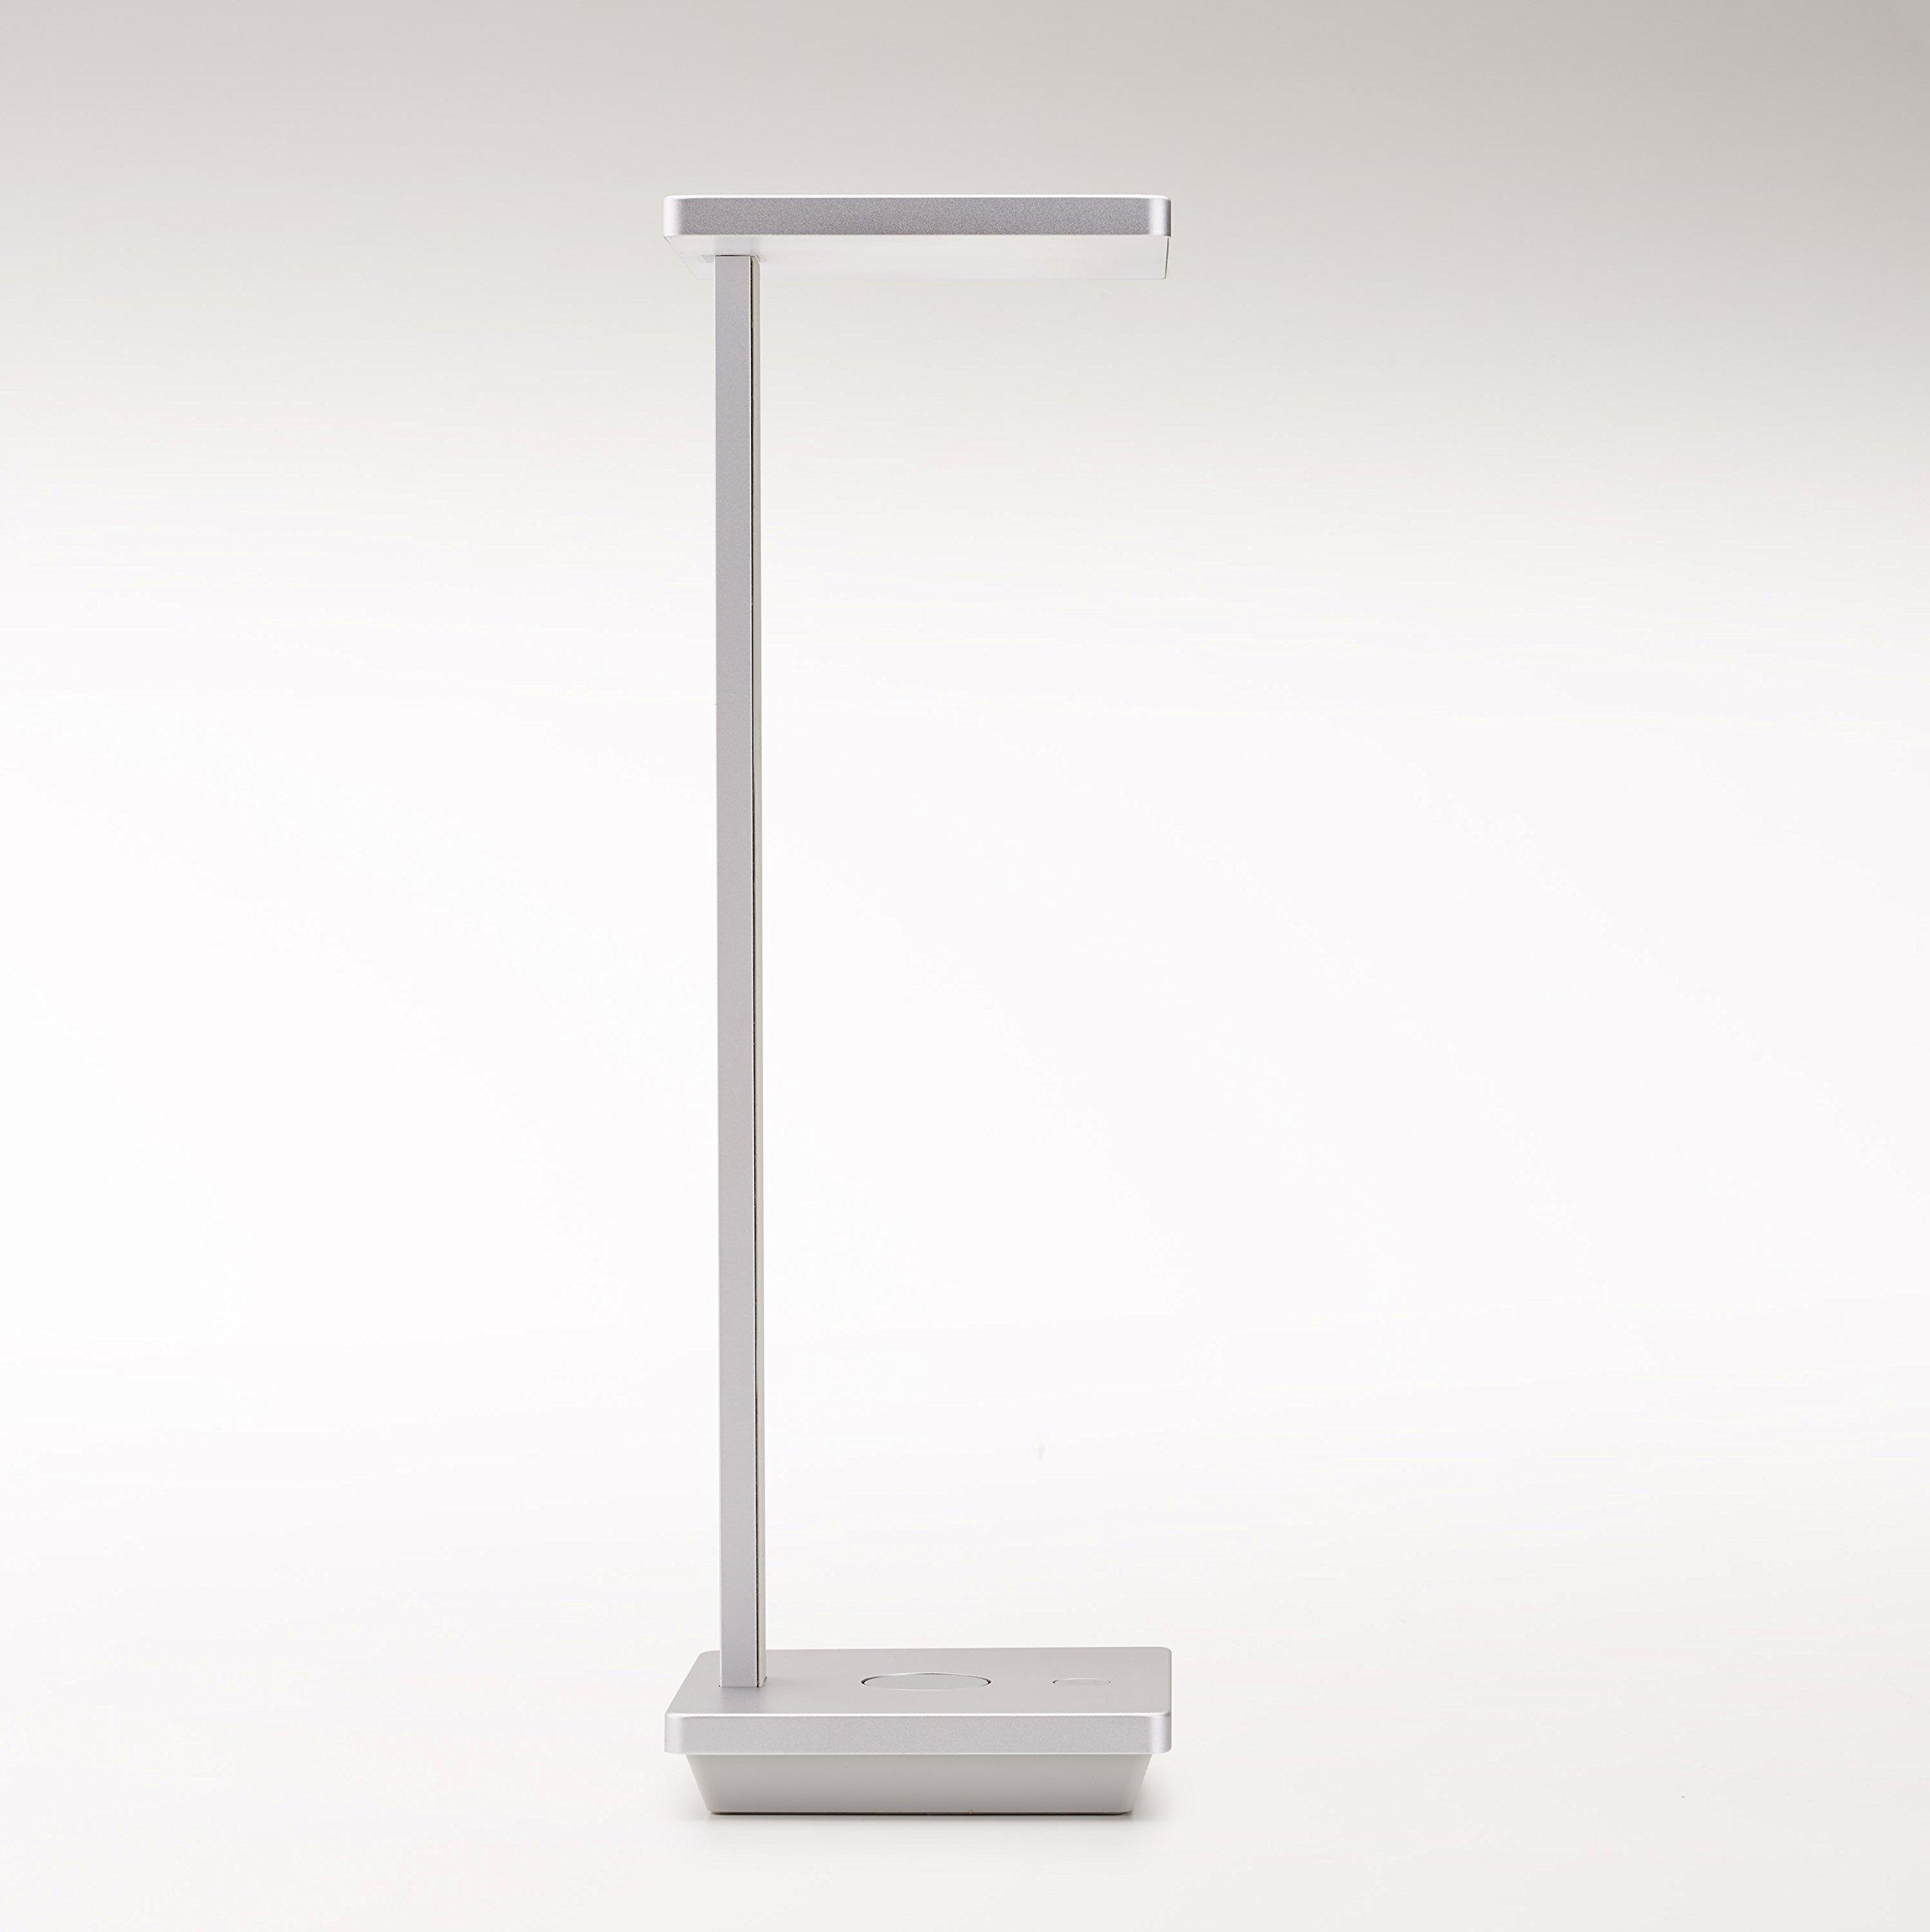 NuAns [TILE] iPhone & iPad Lightning Charging Dock, Desk Lamp with USB, Apple Certified MFi, Silver-Award Winner of iF Design Award 2016/2015 Good Design Award & Best of CES 2015|Gift & Presents